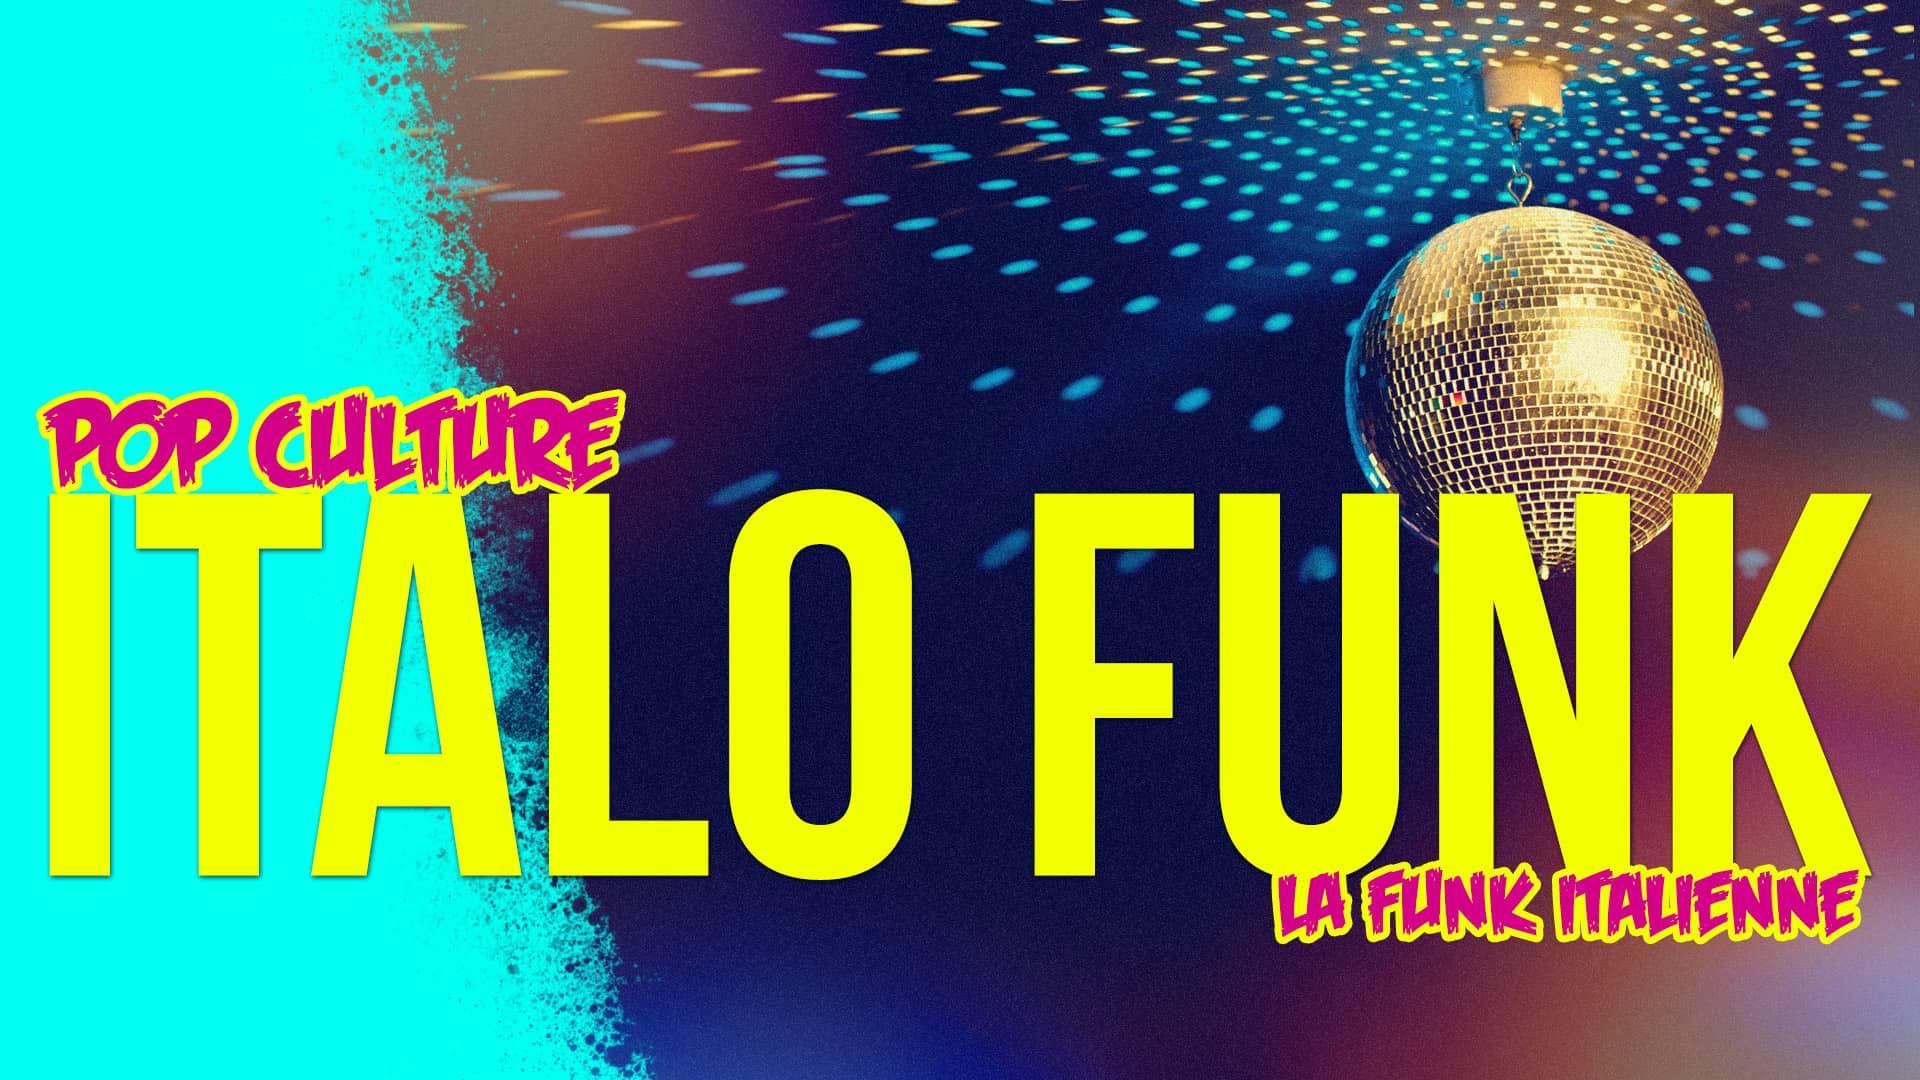 Pop Culture - Italo Funk | Blog In Lyon